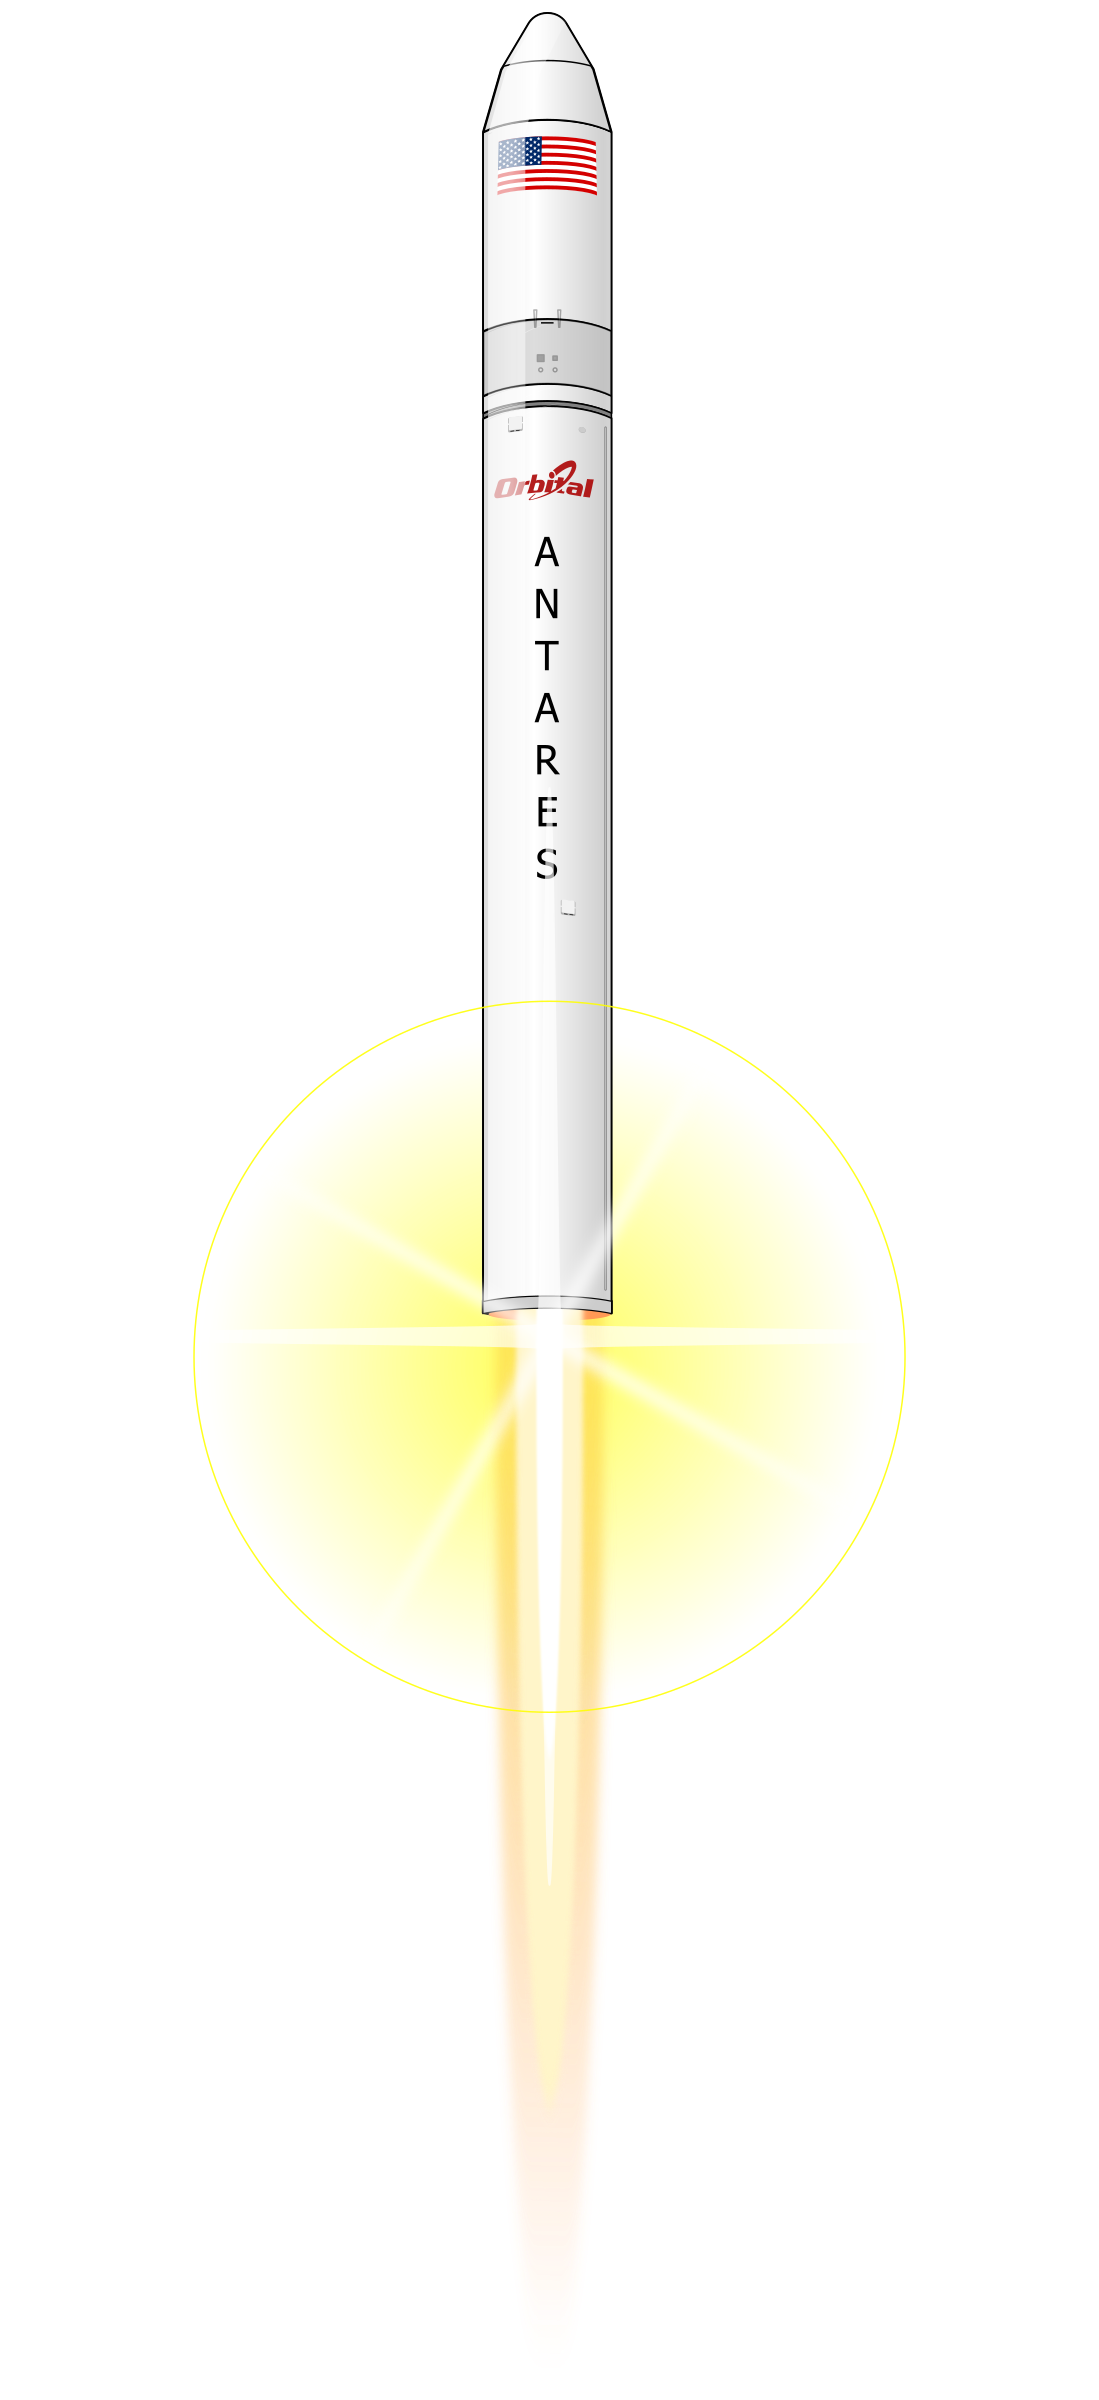 Antares (rocket) - Wikipedia